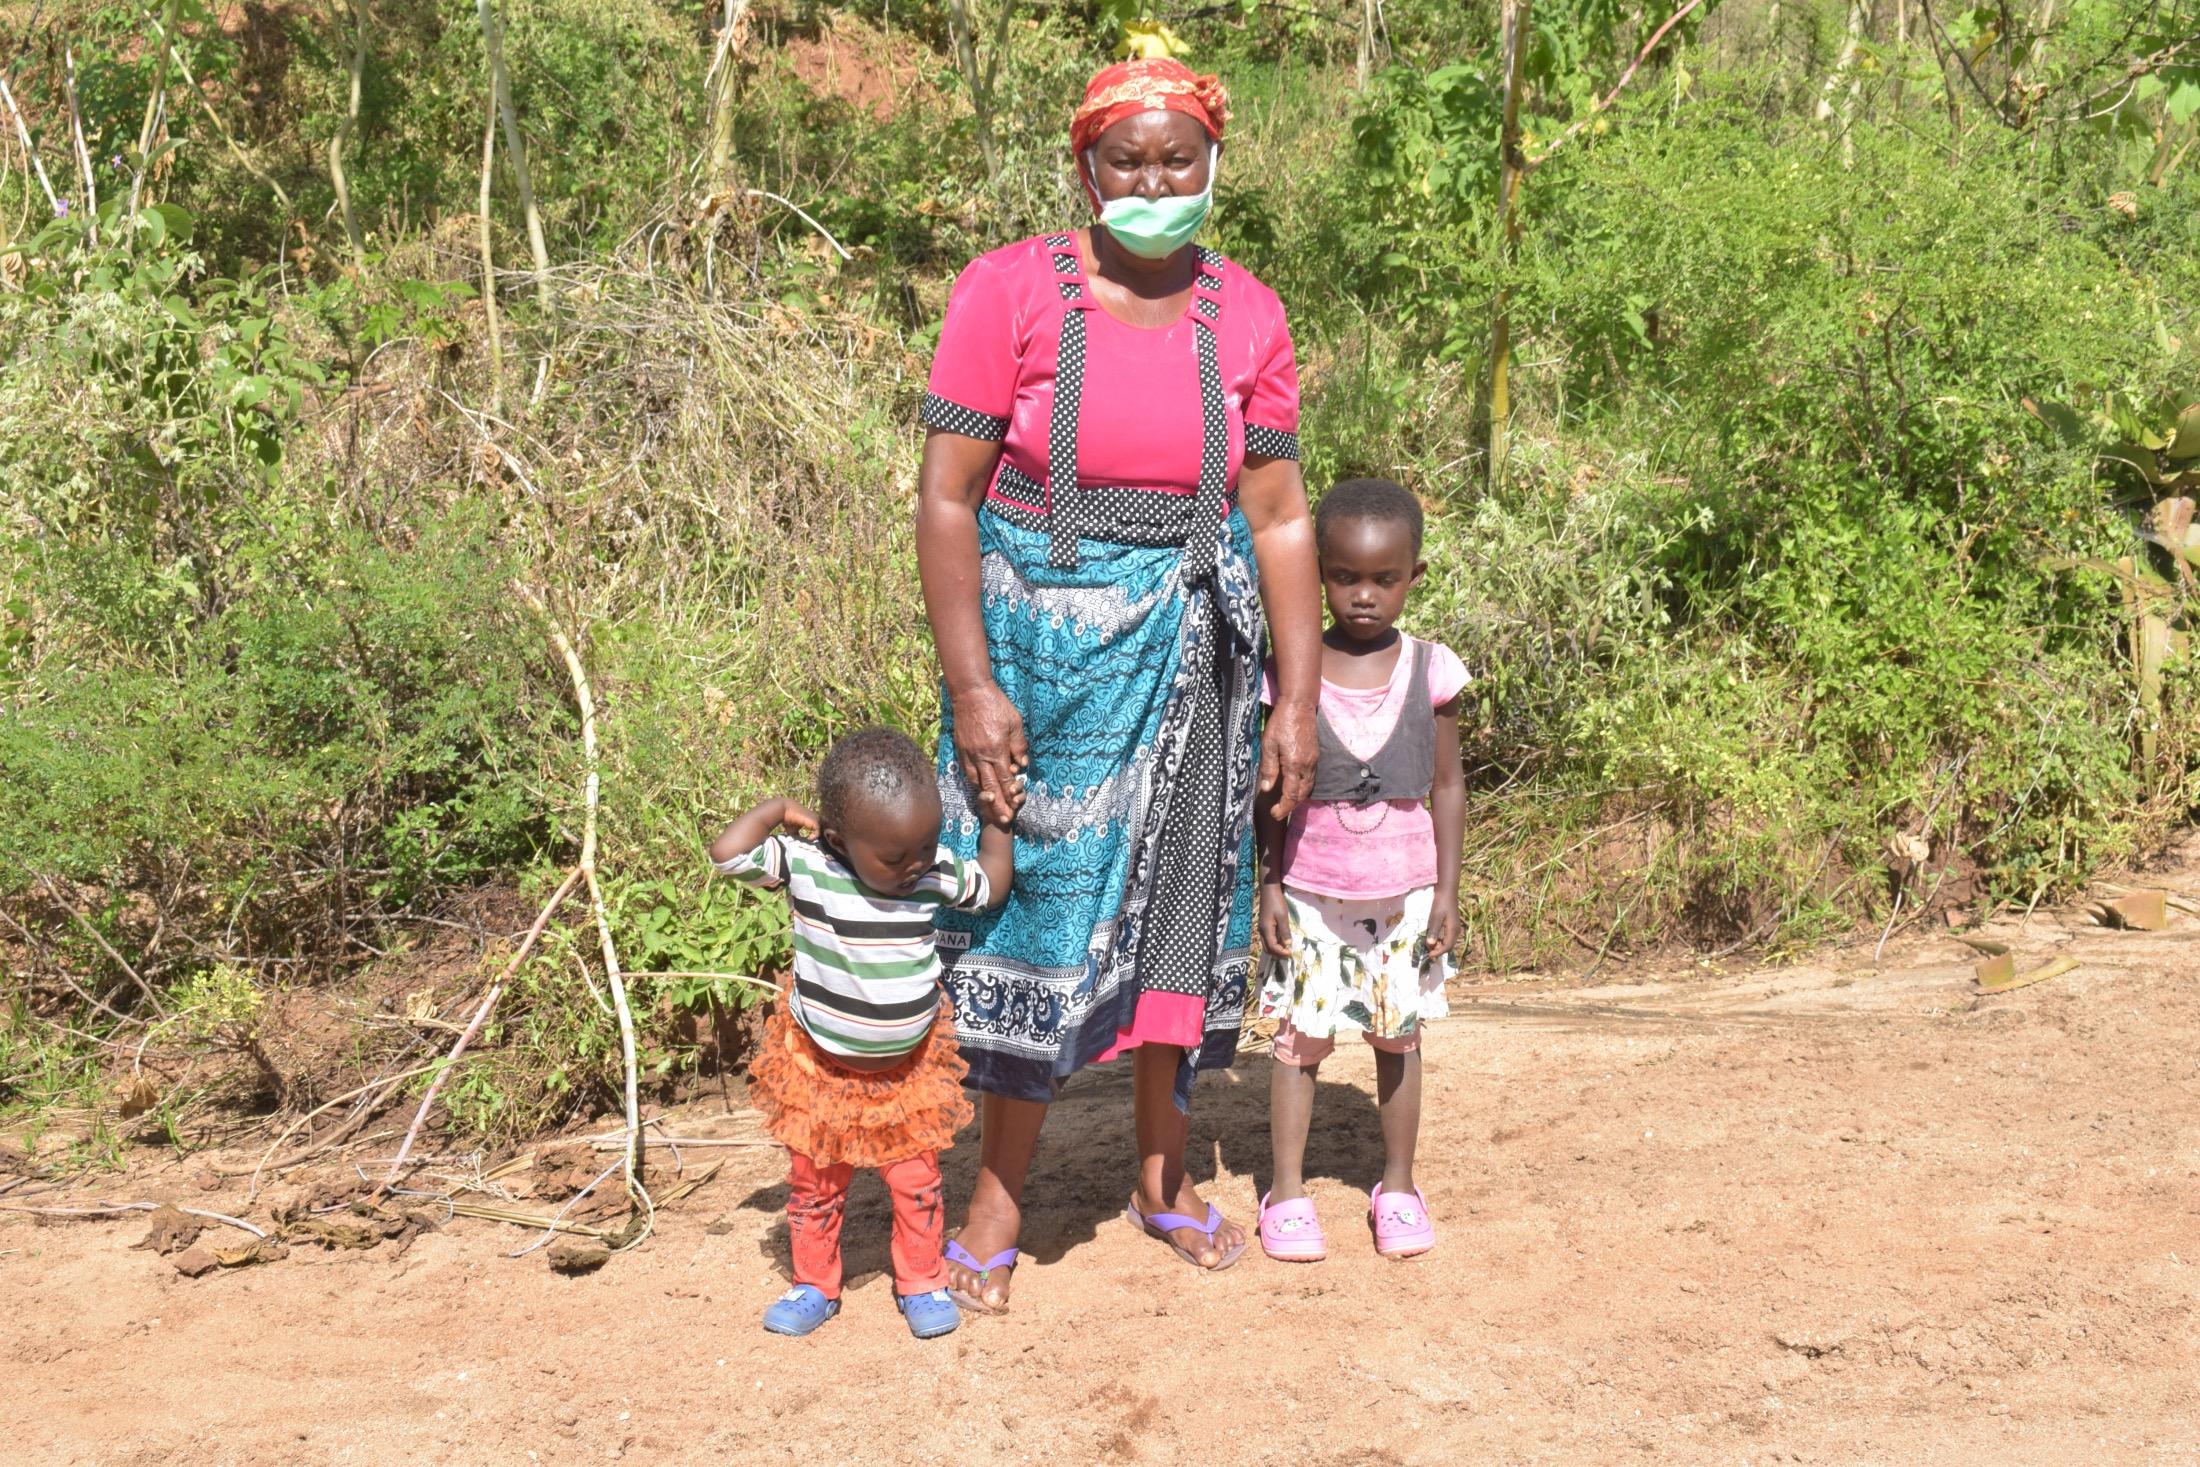 The Water Project : kenya18221-mary-kitheka-61yrs-1